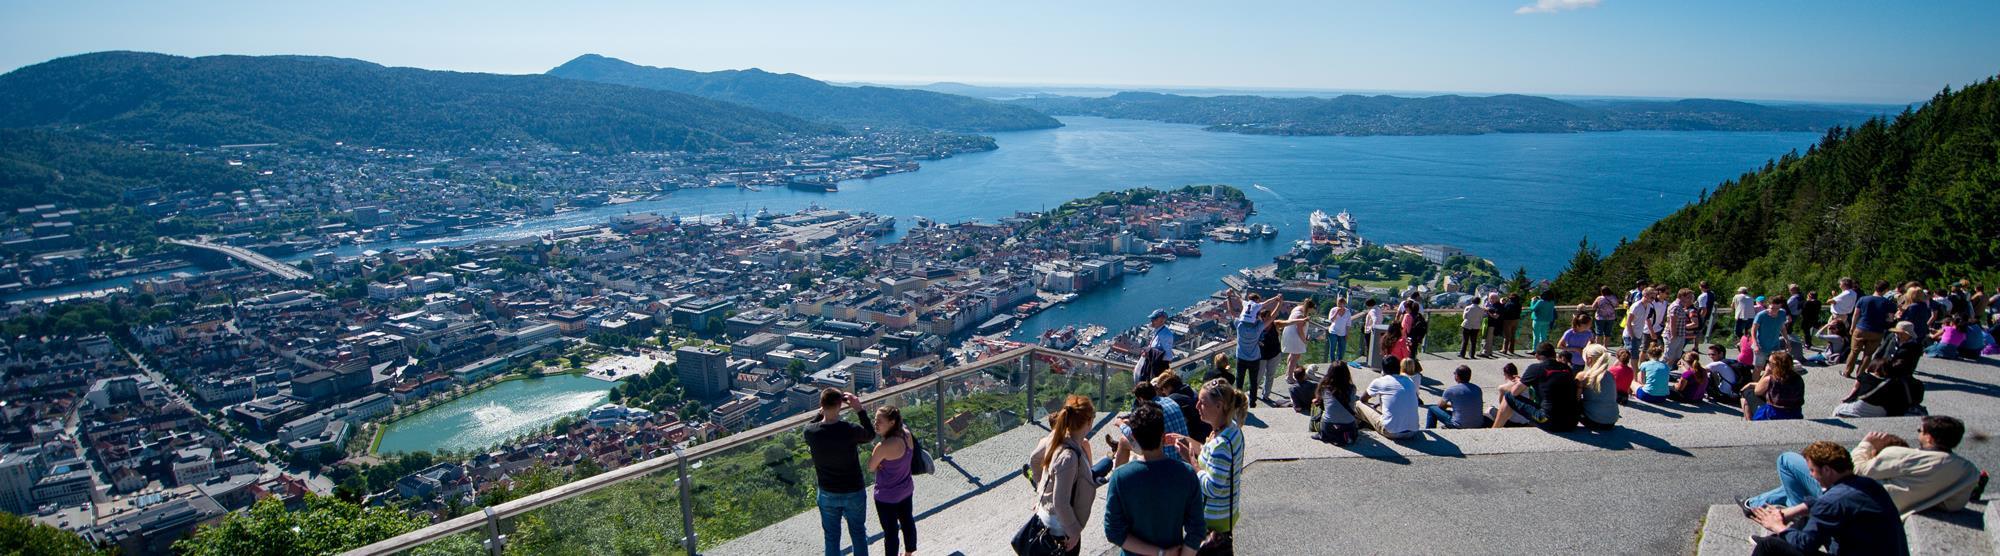 3 day program in Bergen, Norway